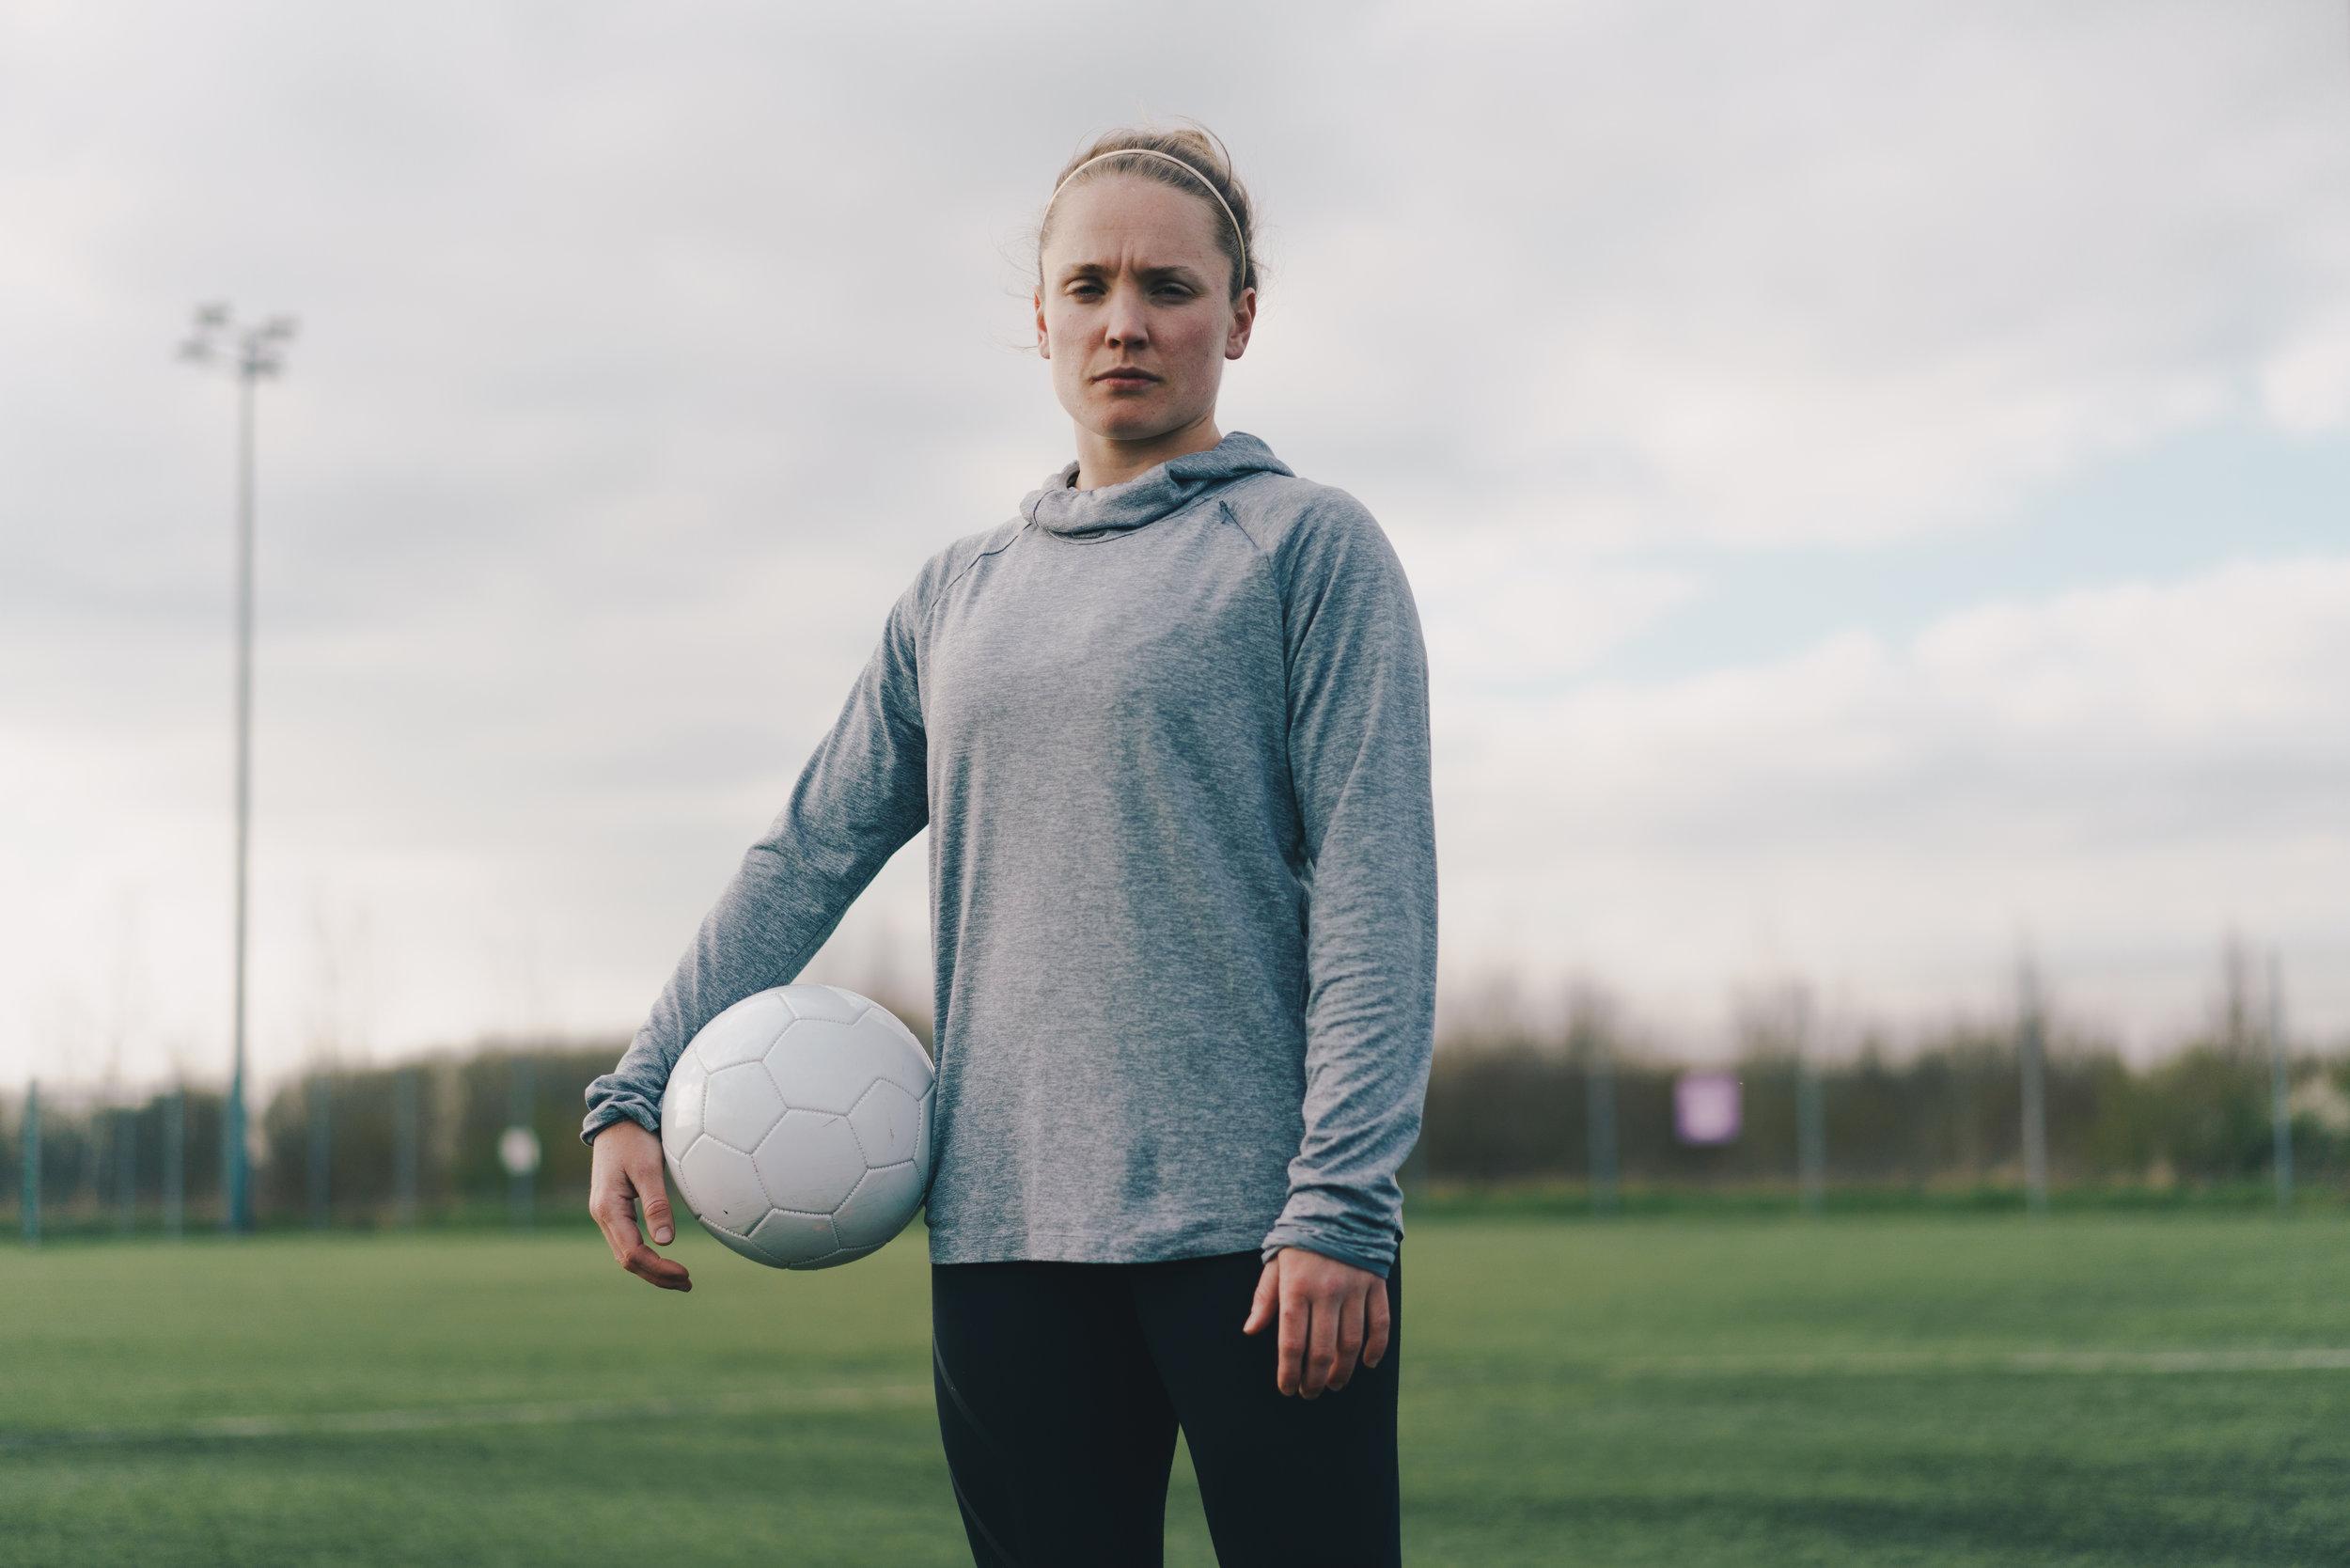 VISA - WOMEN IN FOOTBALL - Women's World Cup 2019